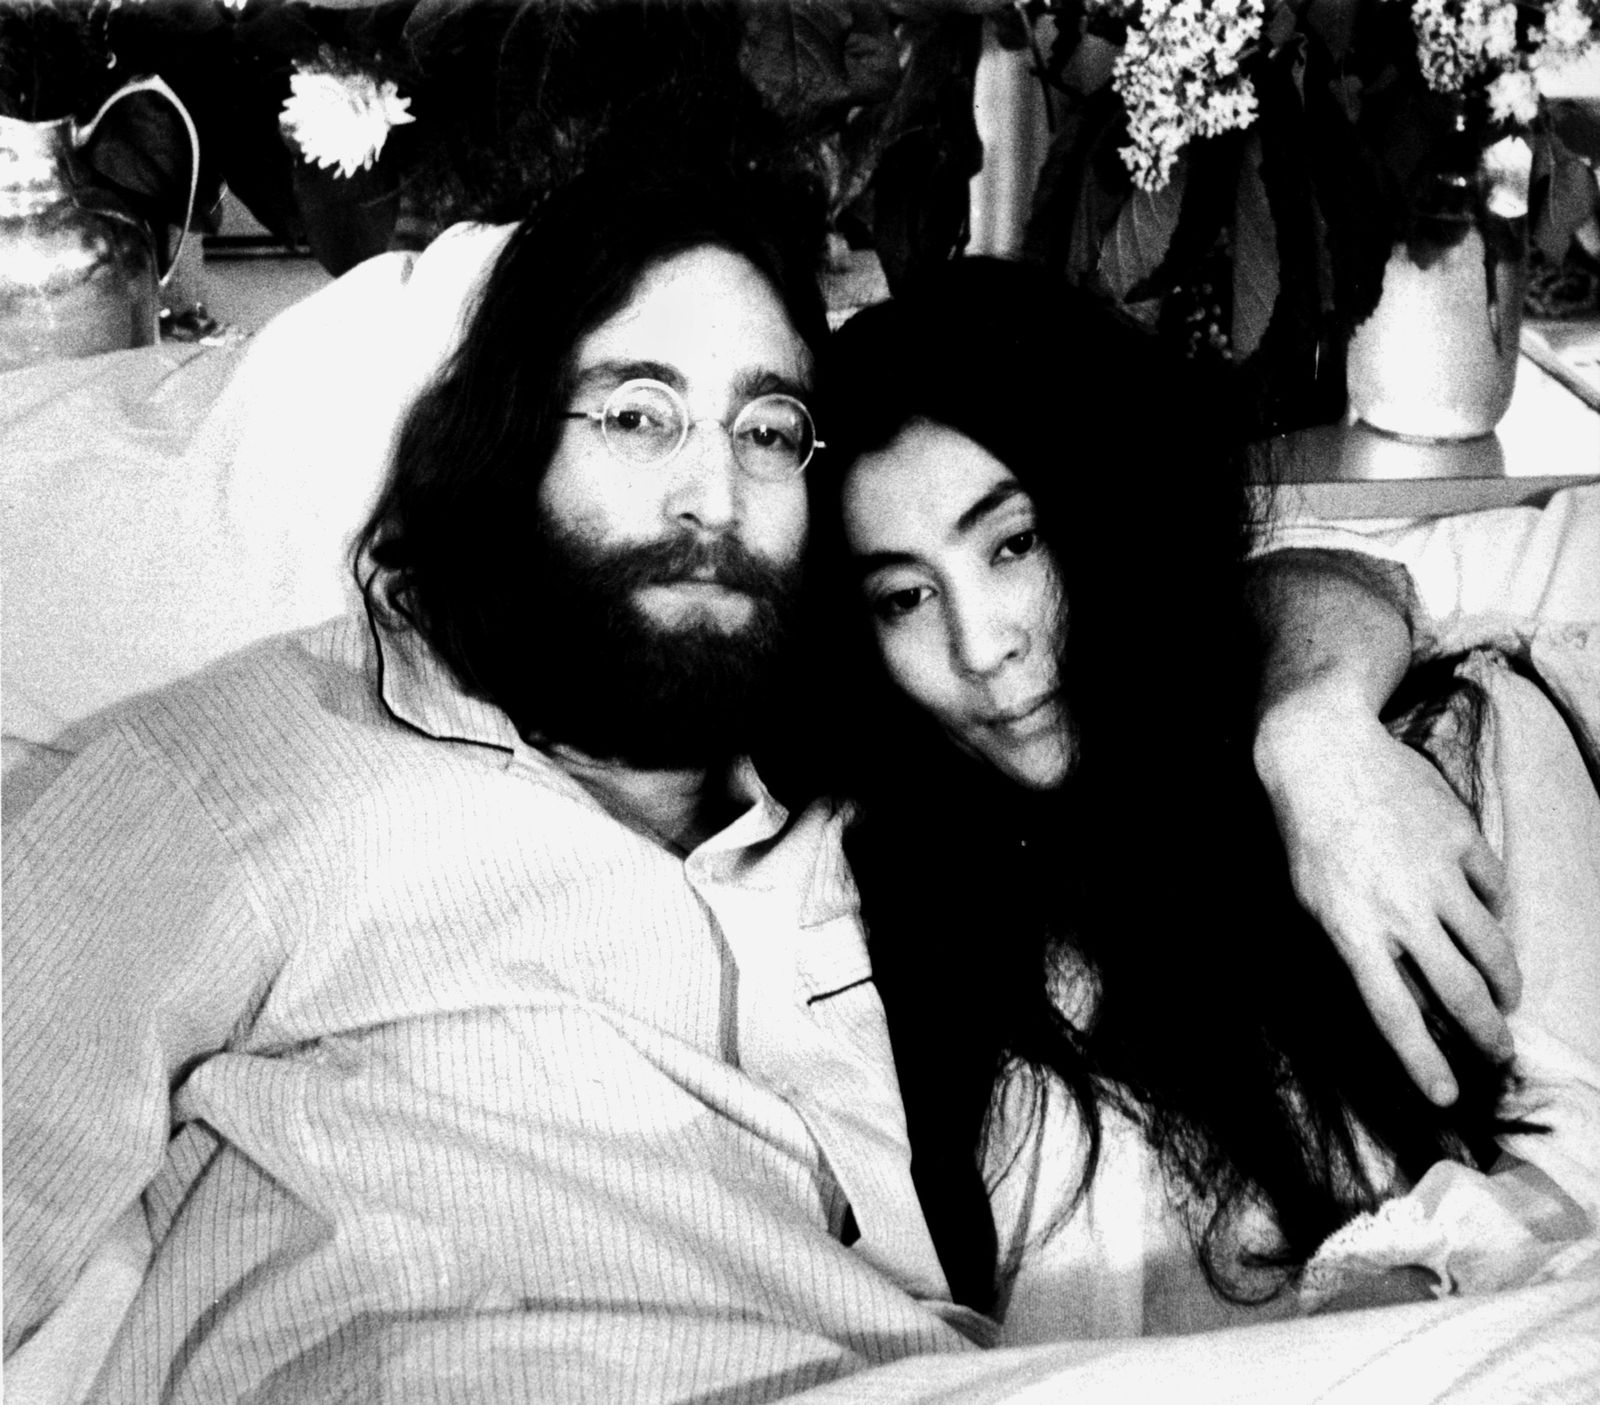 Tageskarte/ 14.12.12 / John Lennon und Yoko Ono